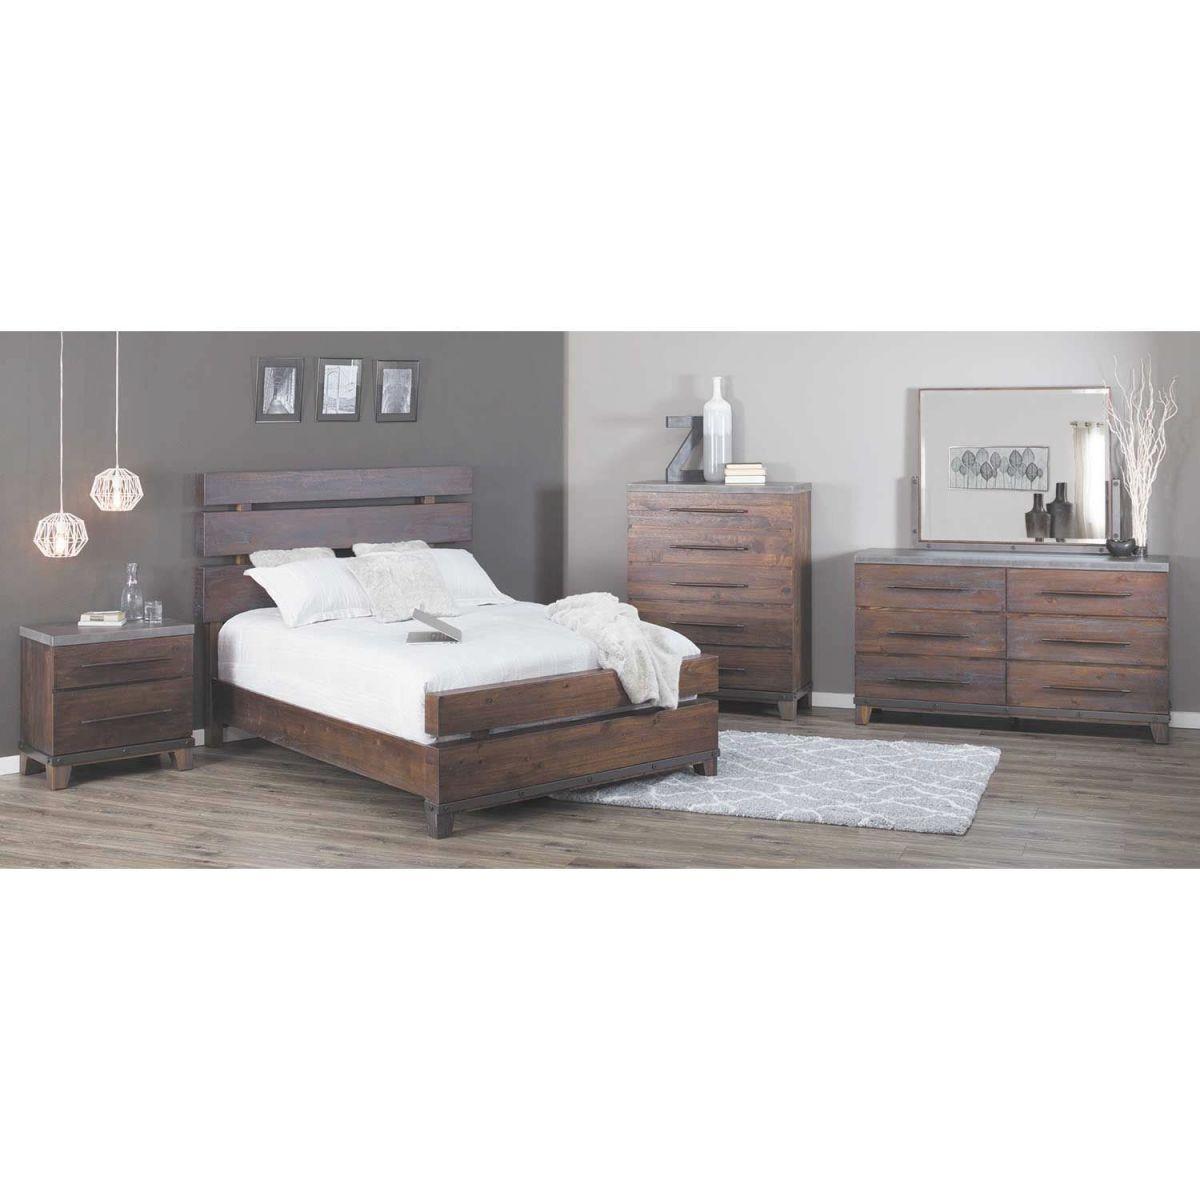 Forge 5 Piece Bedroom Set throughout Unique Rustic Bedroom Furniture Sets